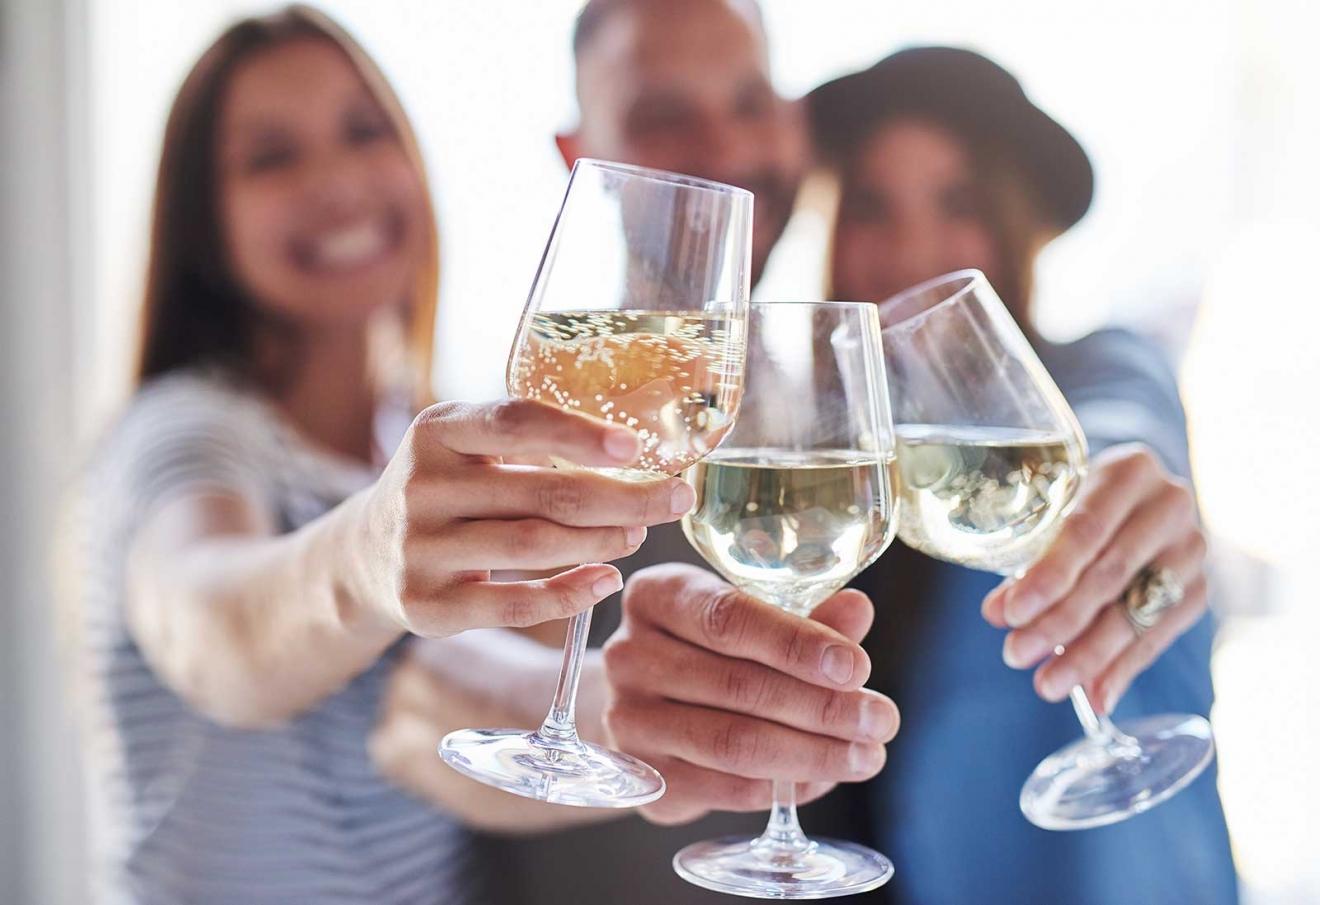 toasting-wine-glasses-with-people-behind-them-8GPRKXK